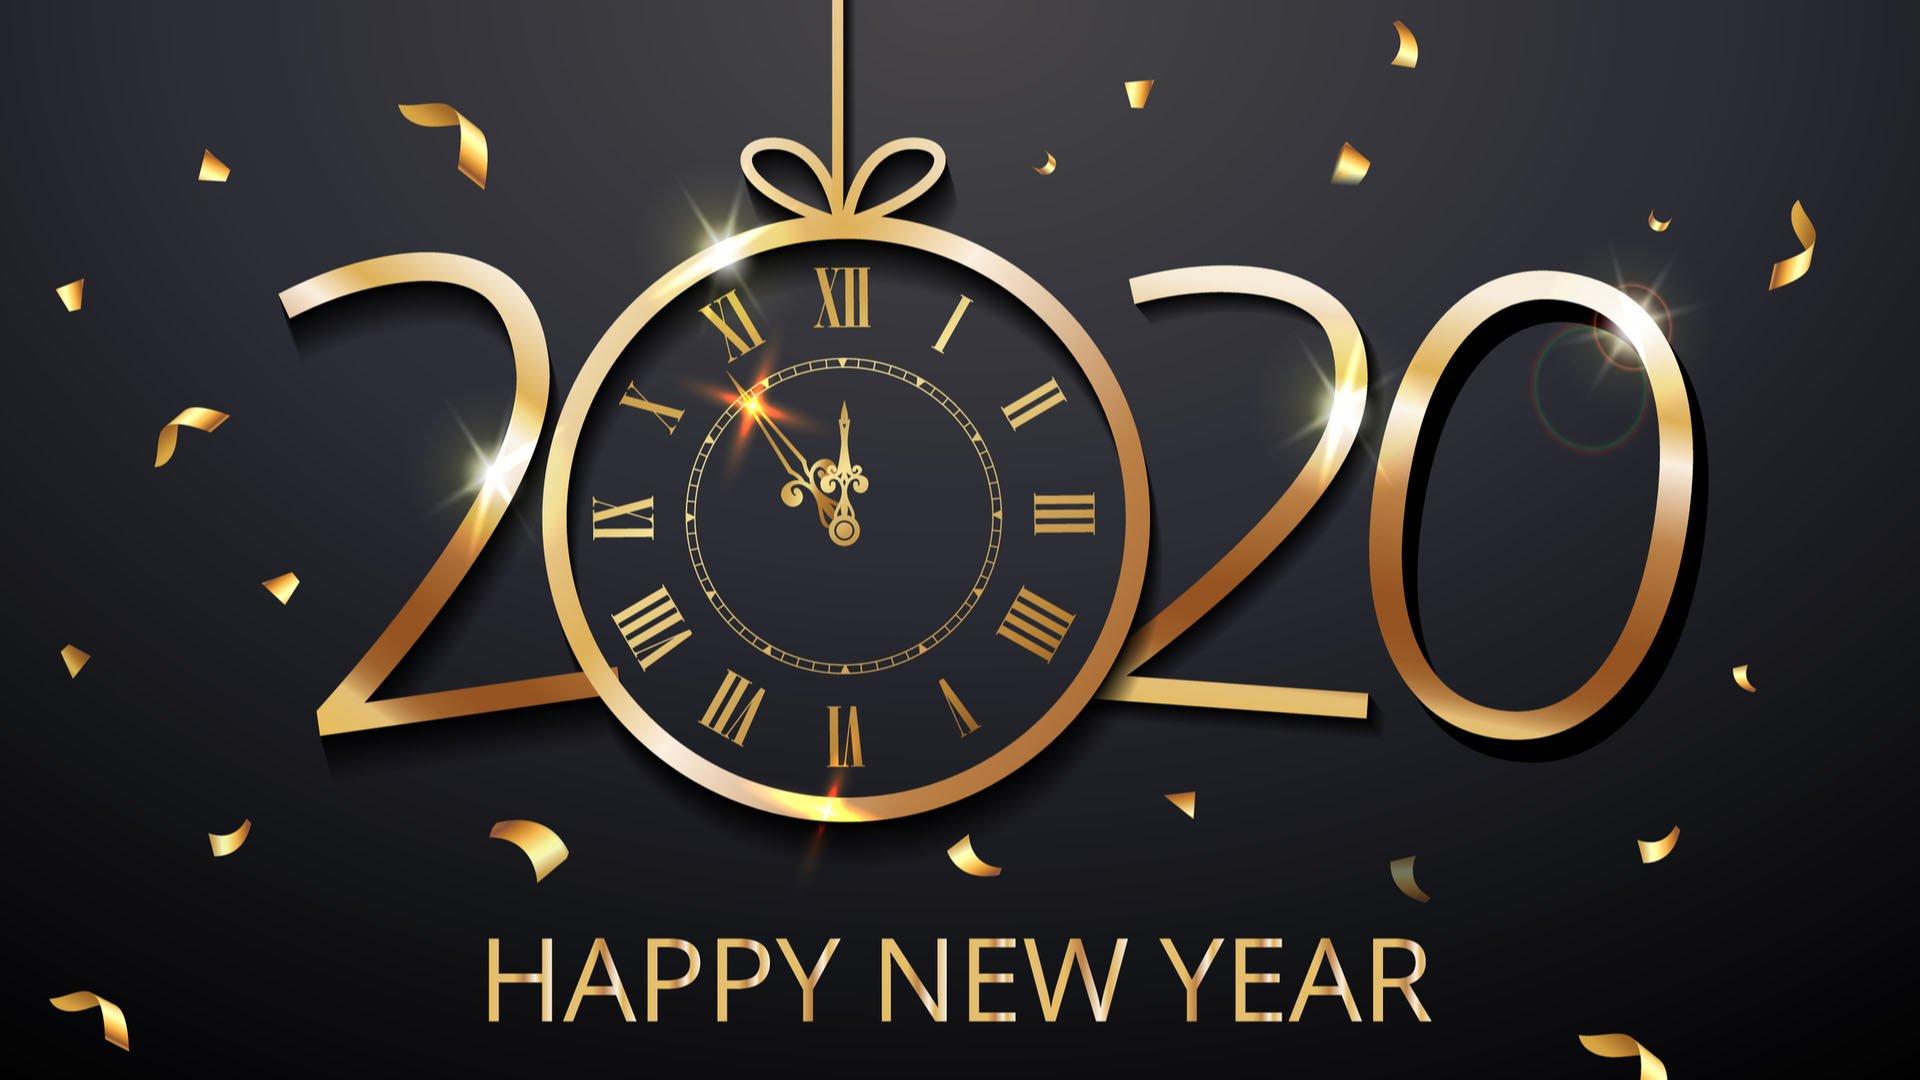 Happy New Year from Clapham School.